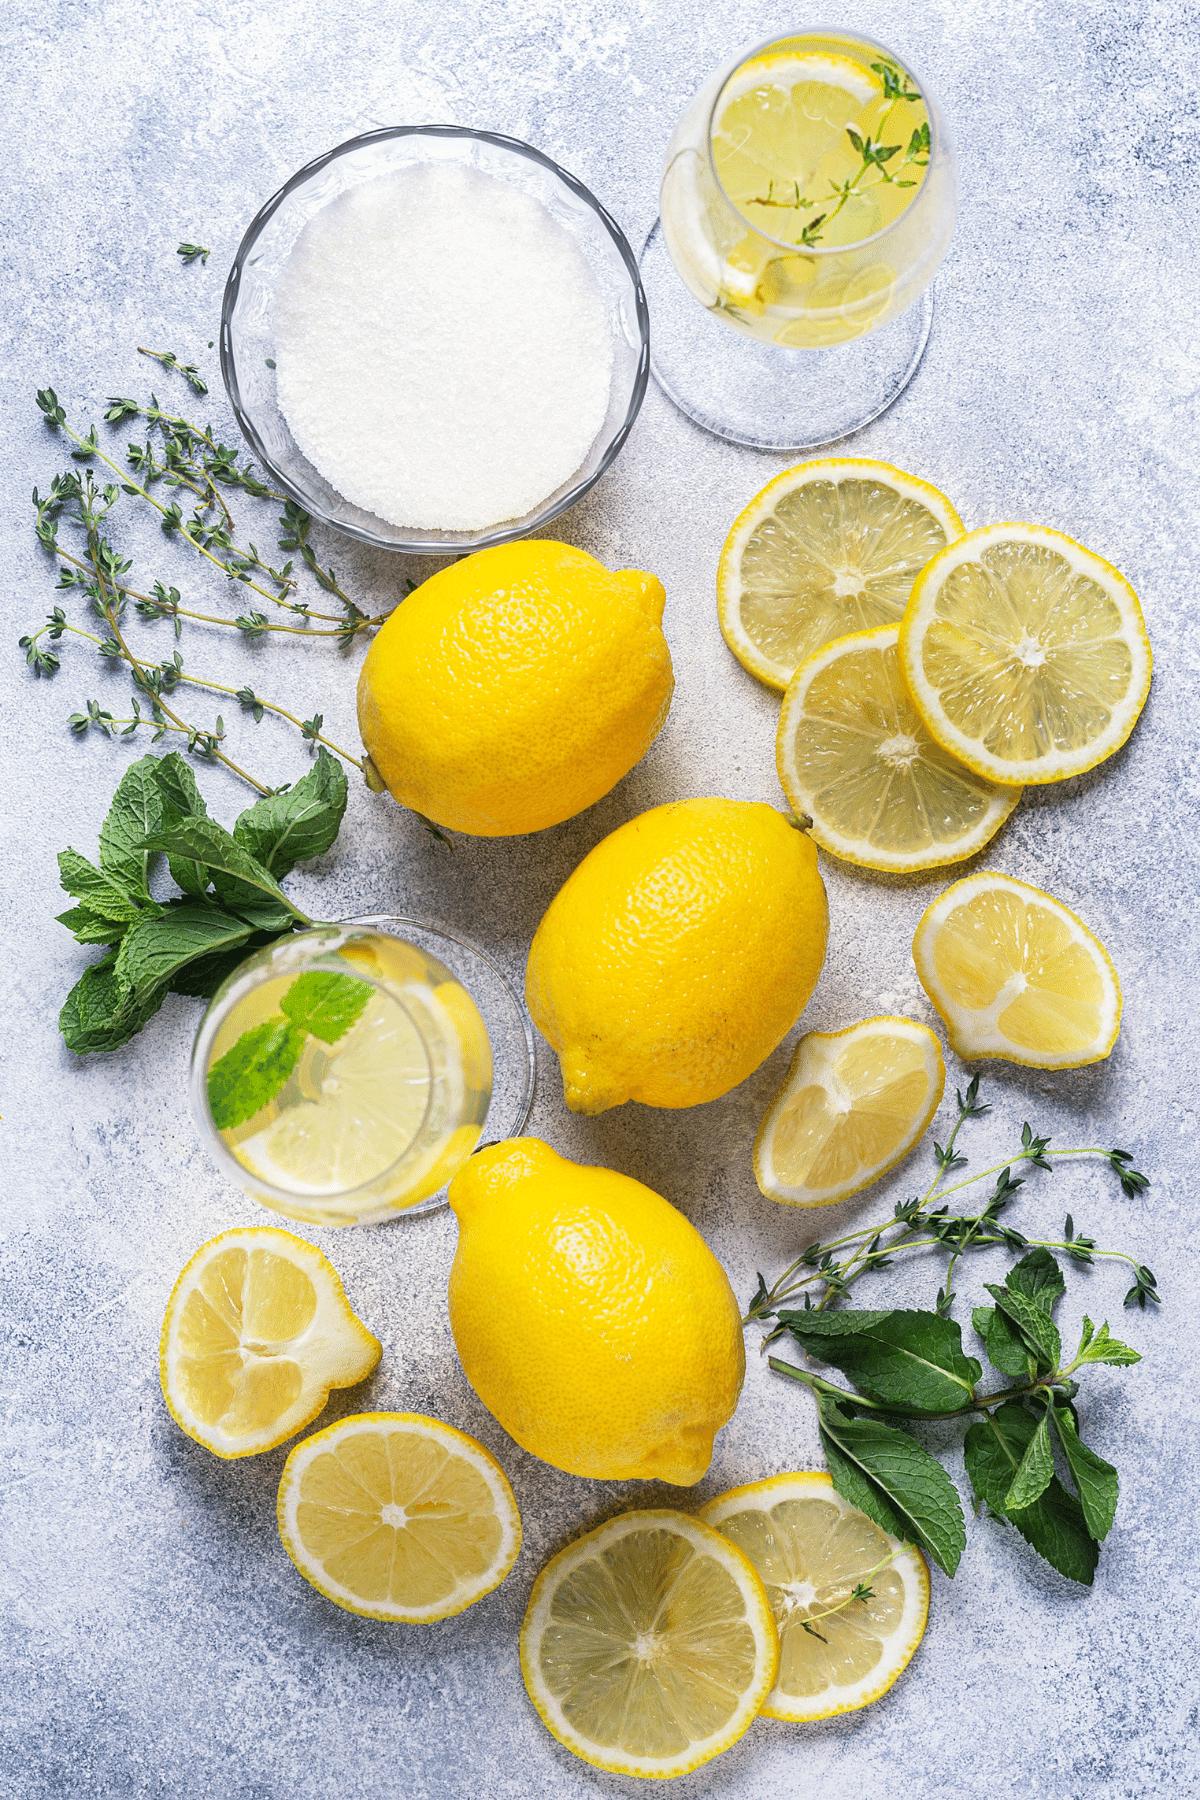 Inngredients needed for making homemade lemonade